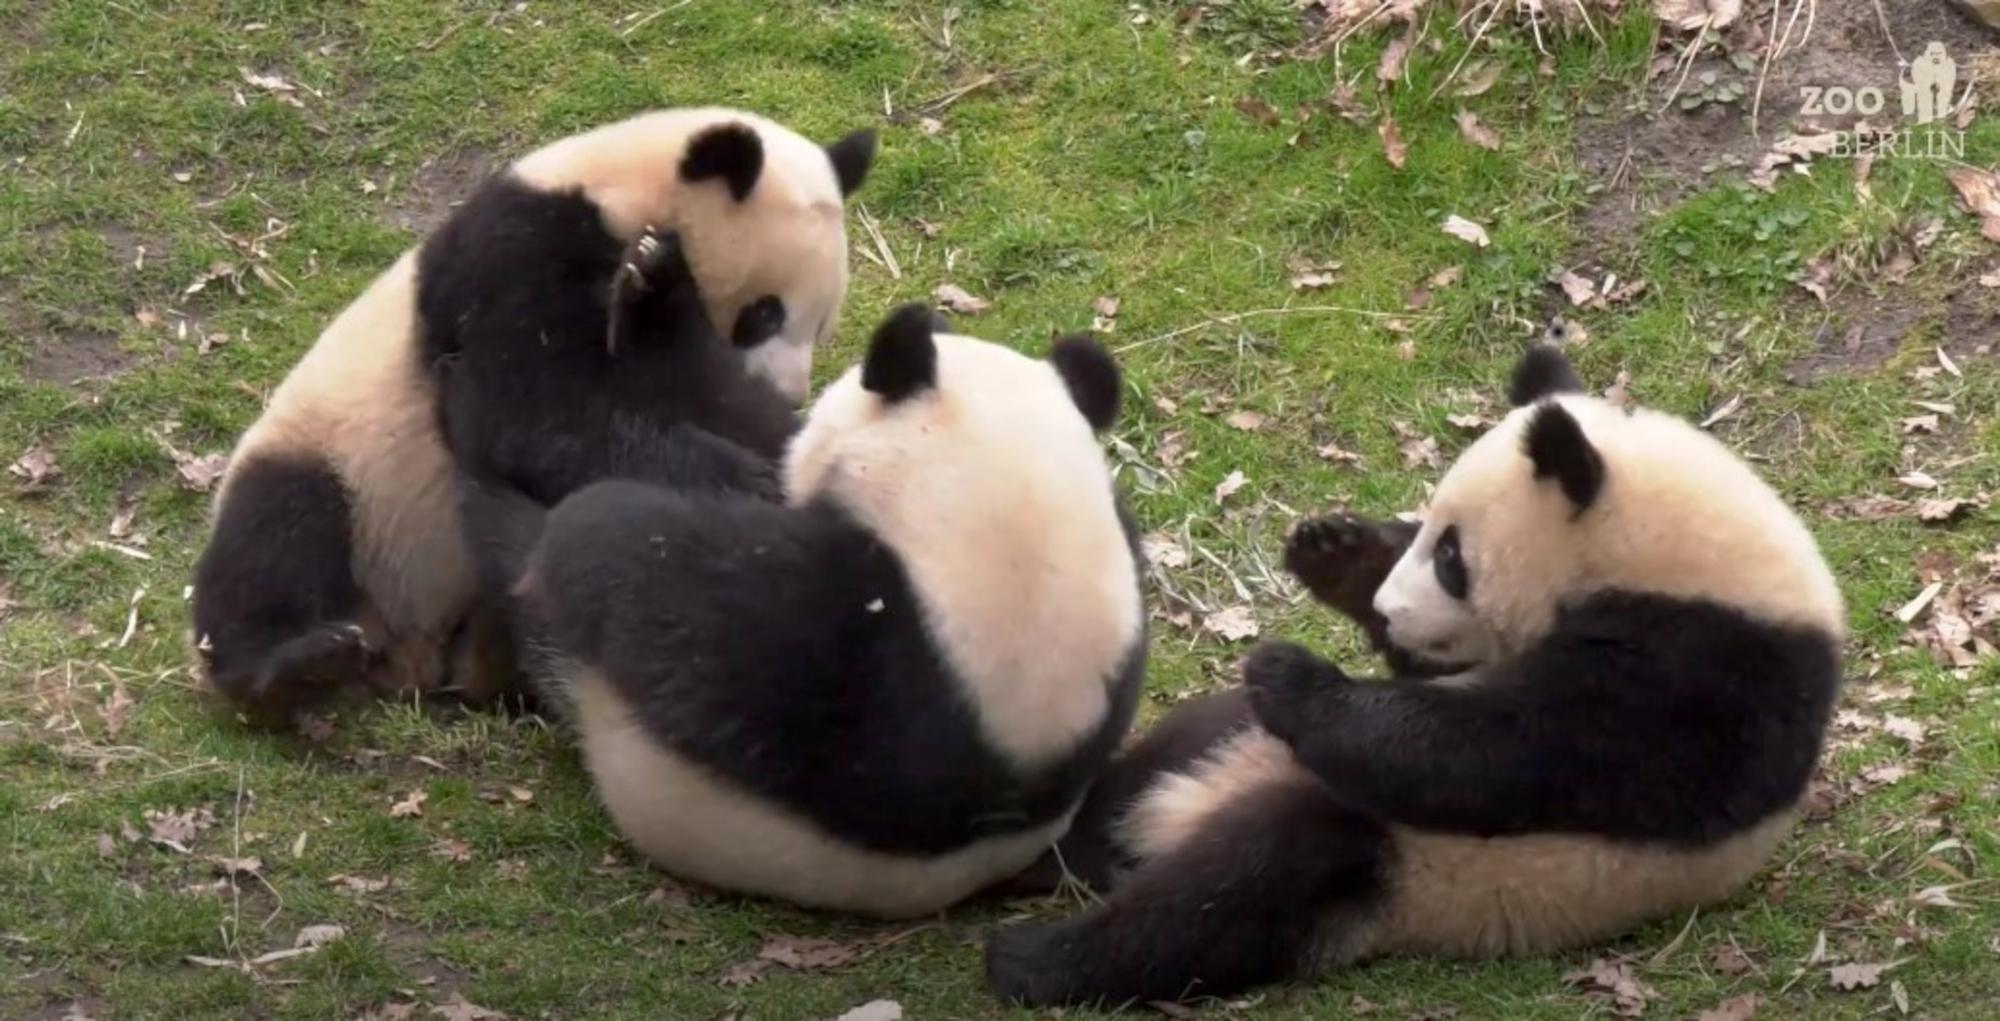 VIDEO: Panda-monium: Playful Twin Cubs Have Captured Berlin's Heart